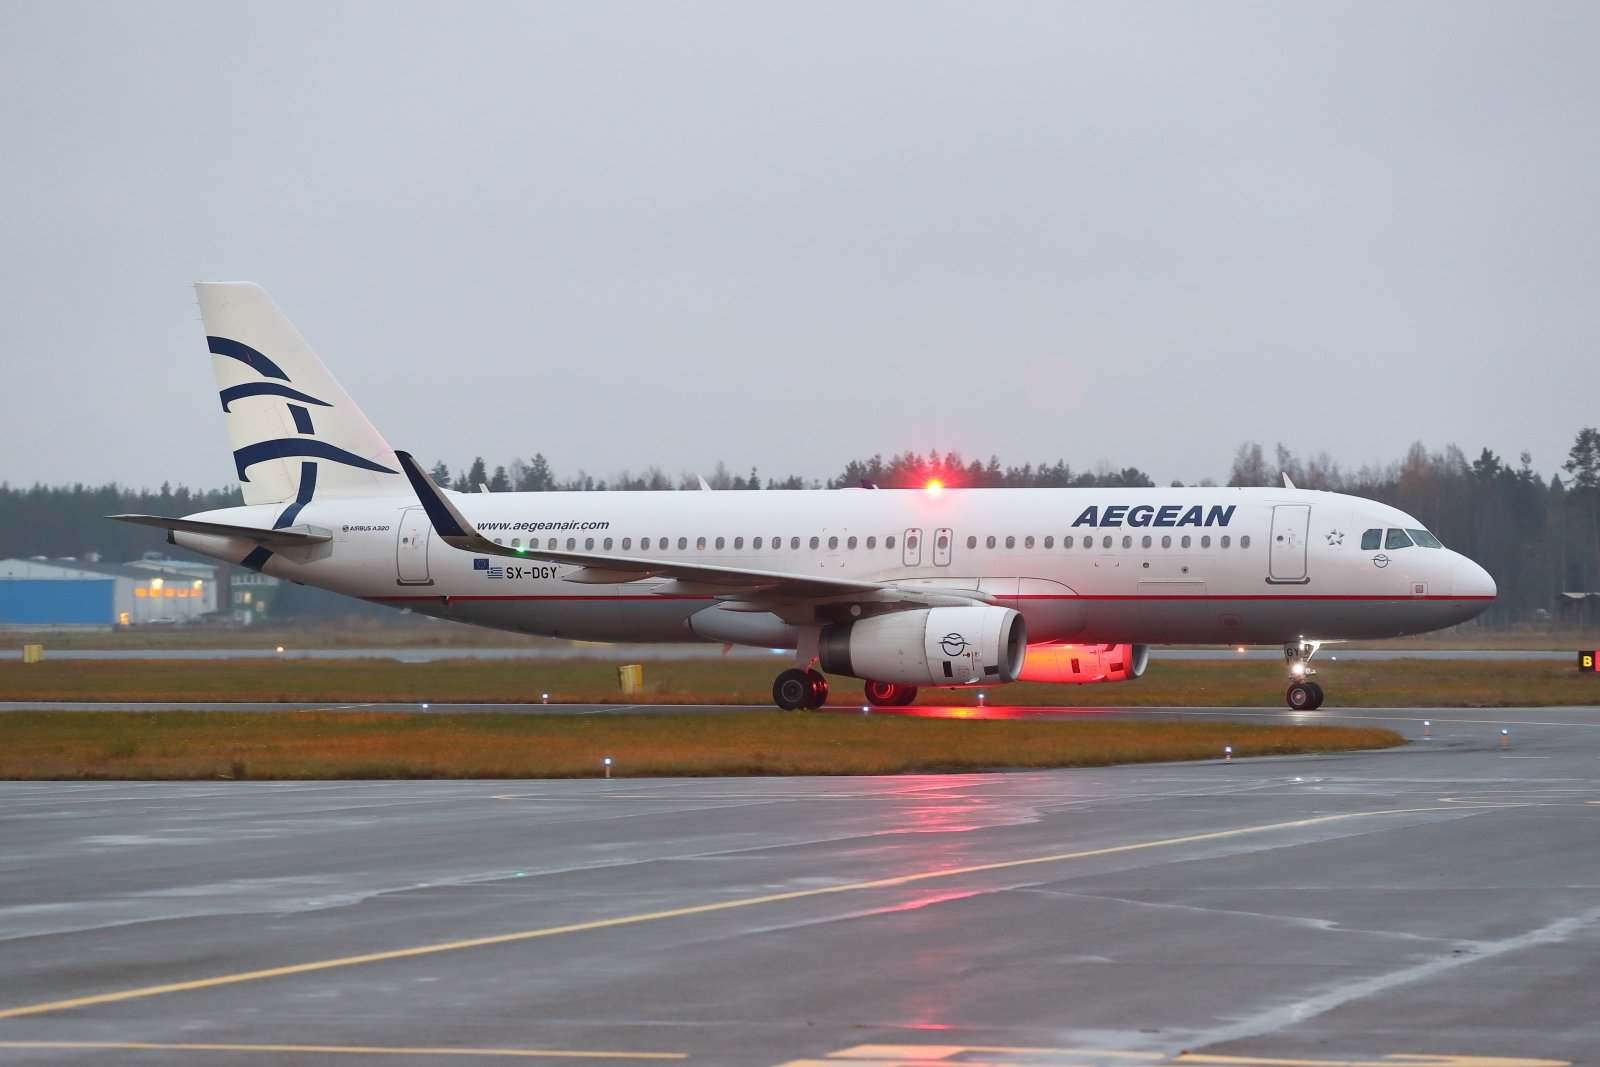 SX-DGY Aegean Airlines Airbus A320-232 saapuu aamuhämärissä Haniasta 25.10.2019